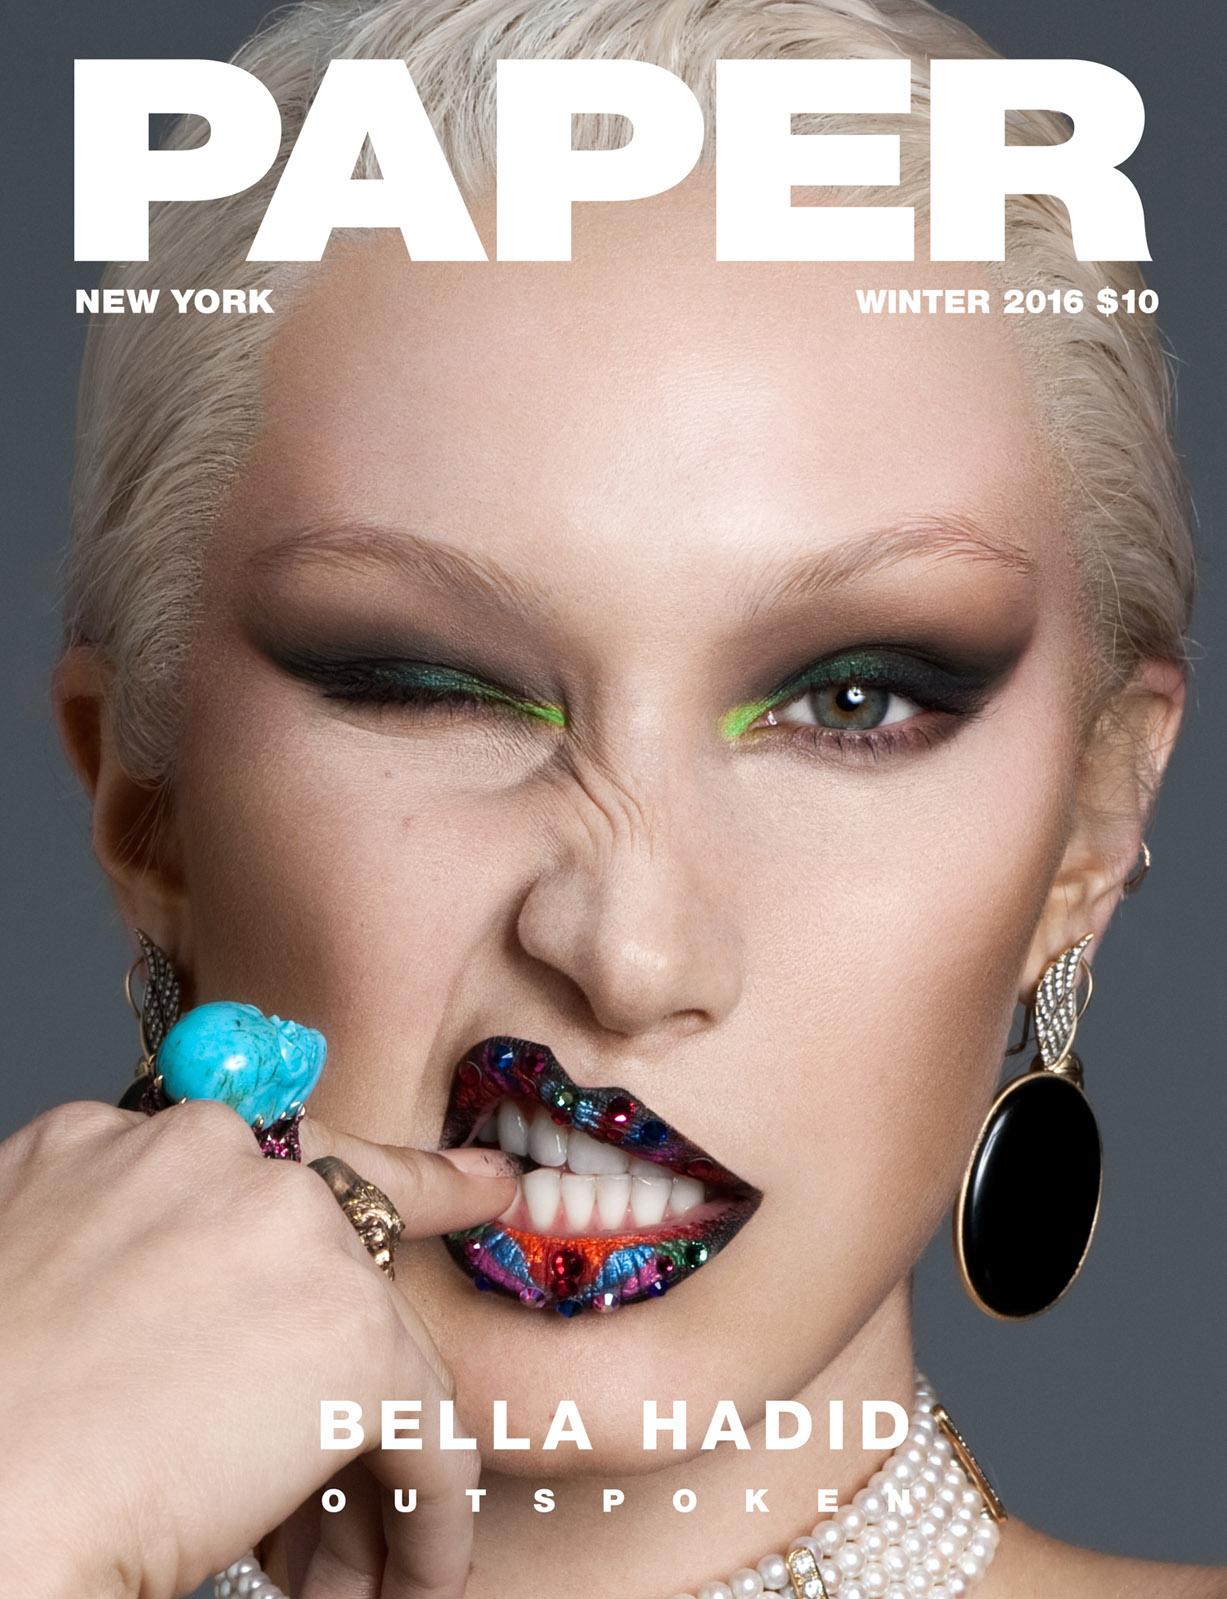 обнаженная Белла Хадид / Bella Hadid by Nicolas Moore - Paper Magazine winter 2016